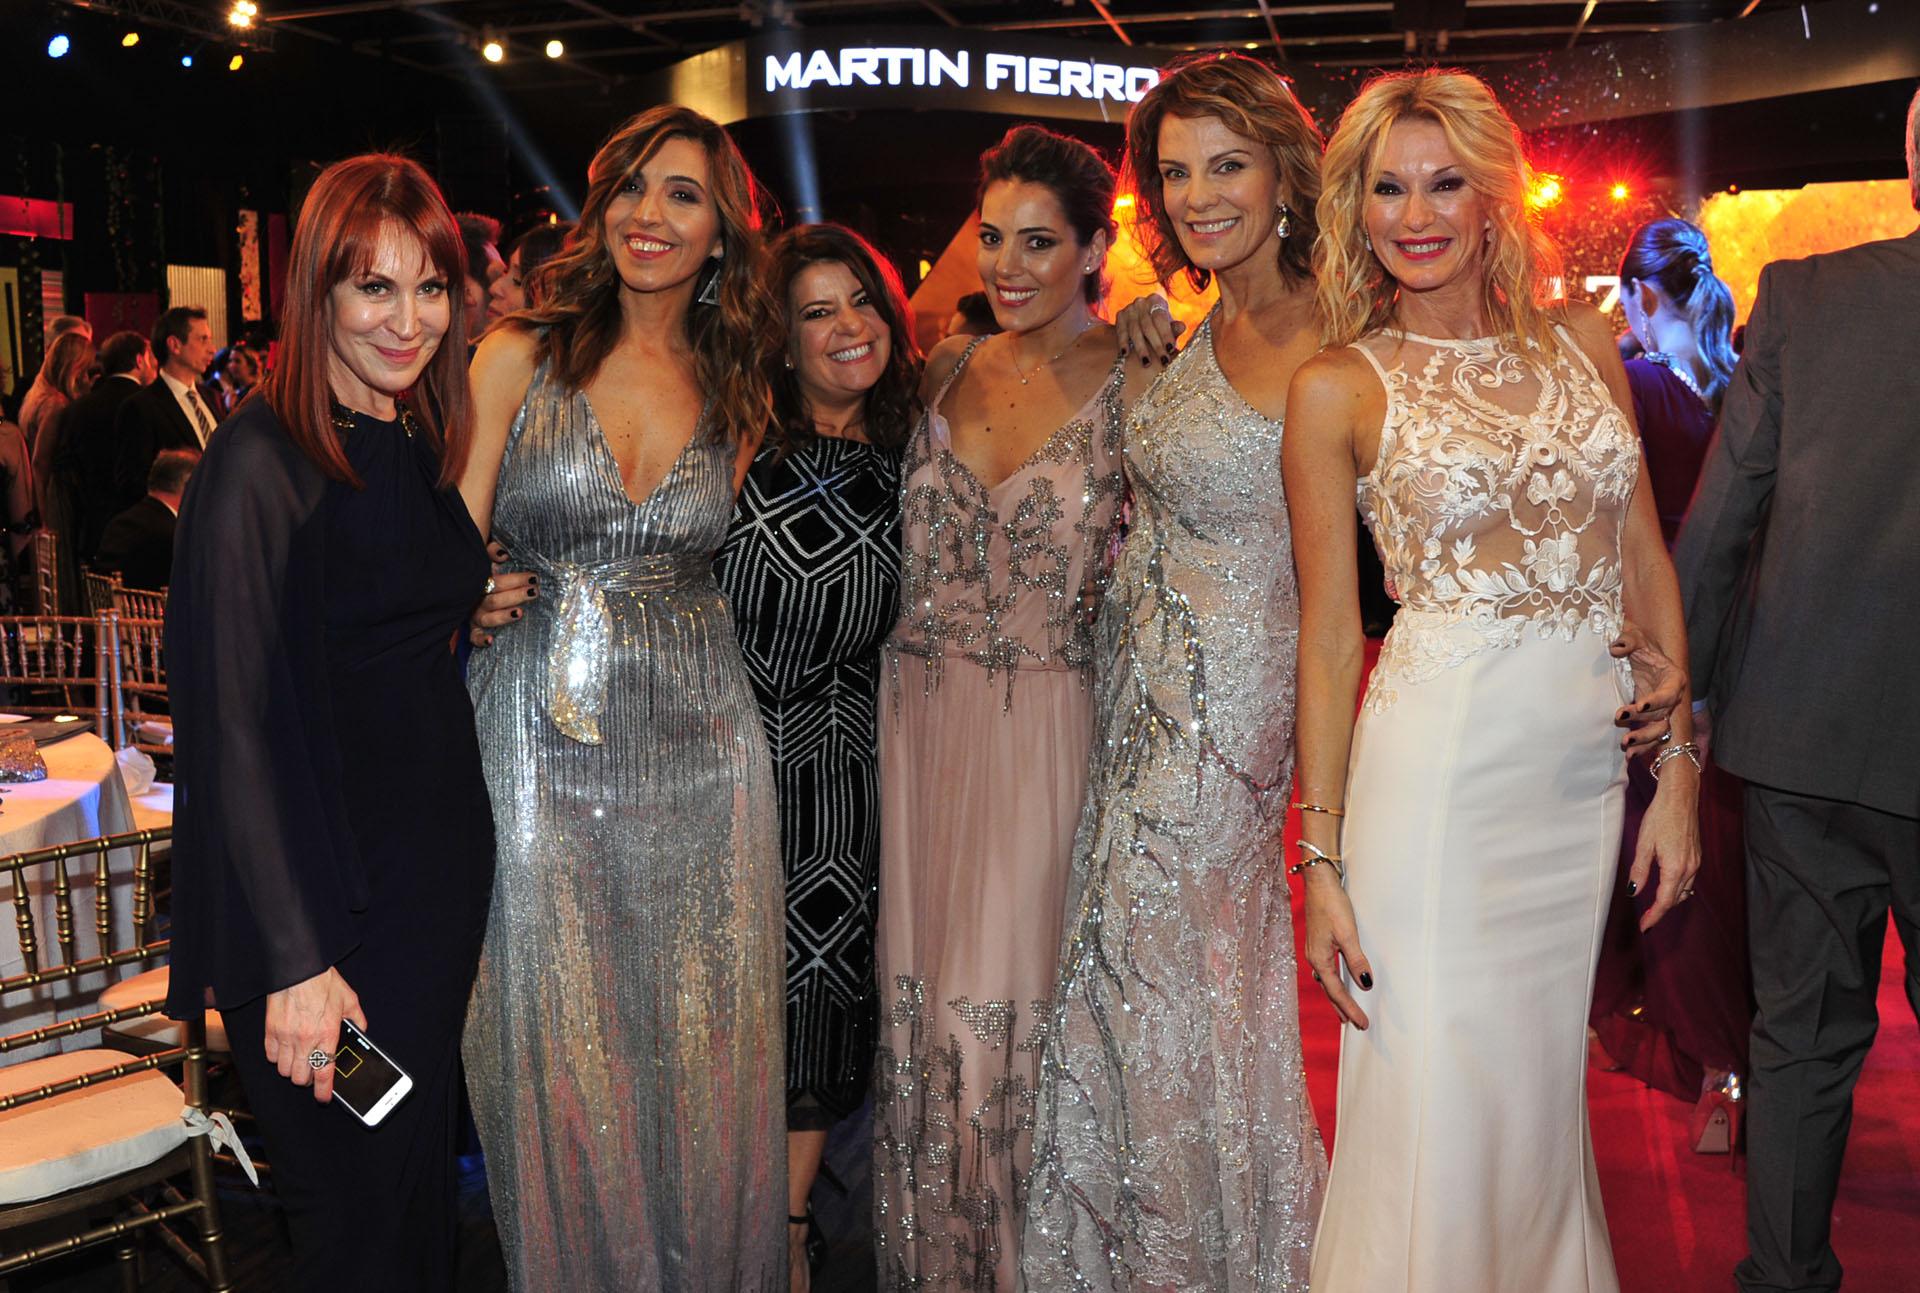 Matilda Blanco, karina Iavícoli, Andrea Taboada, Noelia Antonelli, Nequi Galotti y Yanina Latorre